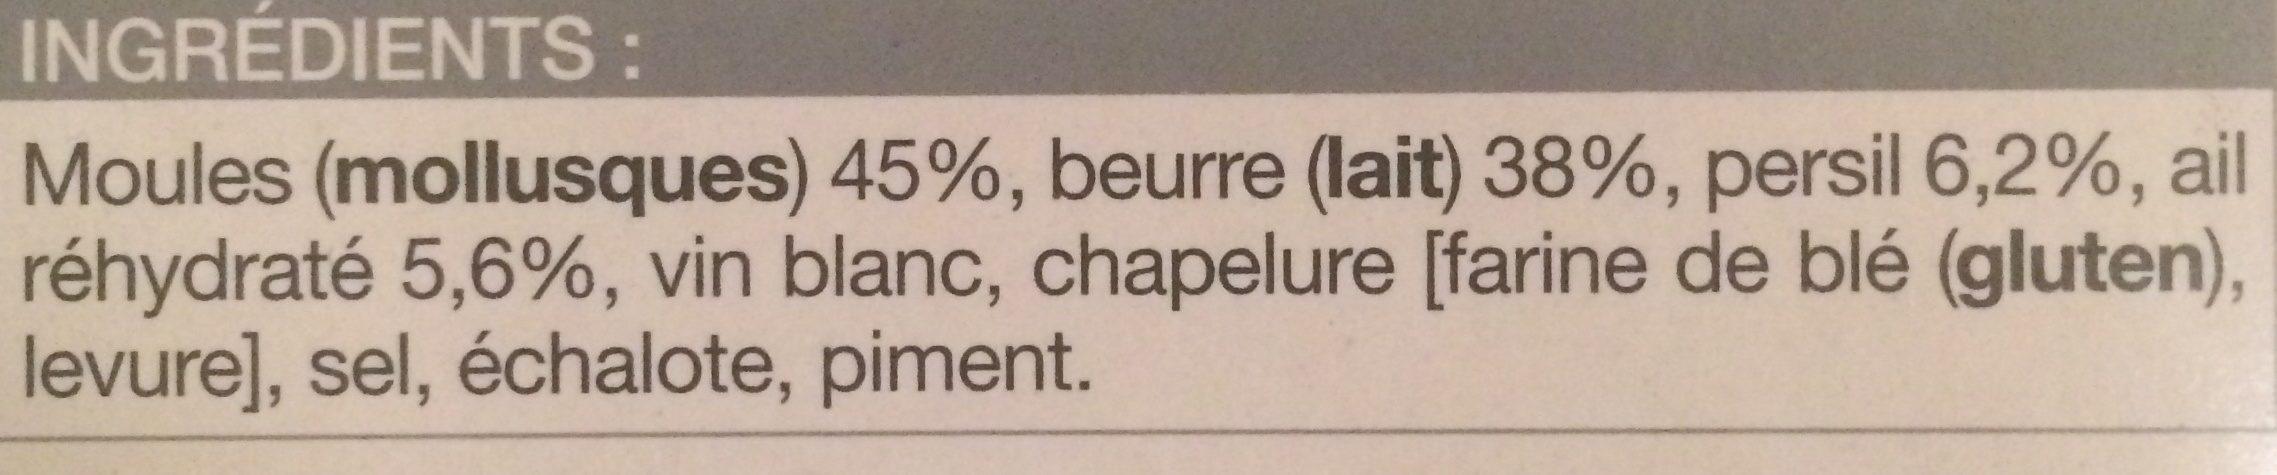 24 Moules Farcies, Boîte De 250 Grammes - Ingrediënten - fr